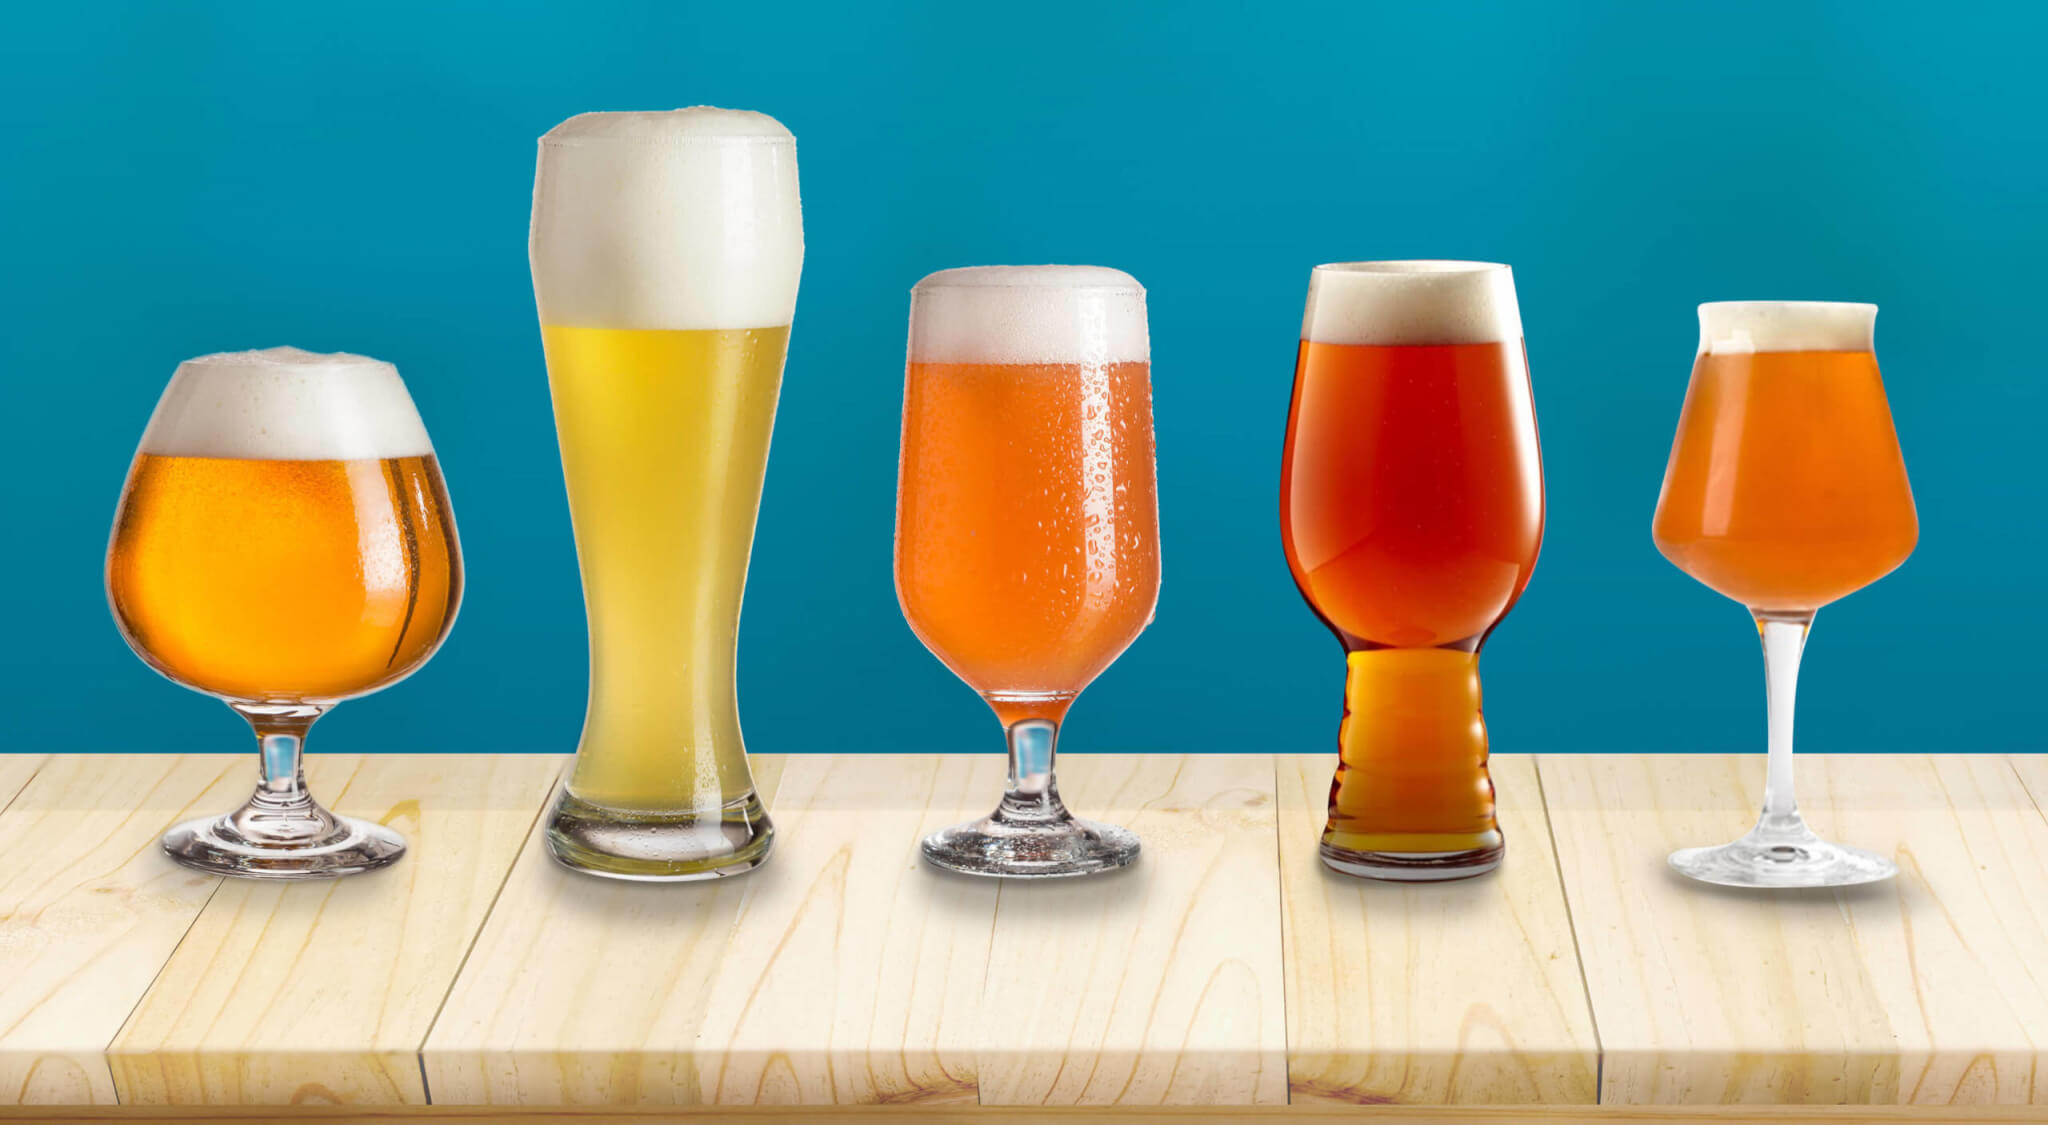 Barons beer glasses guide